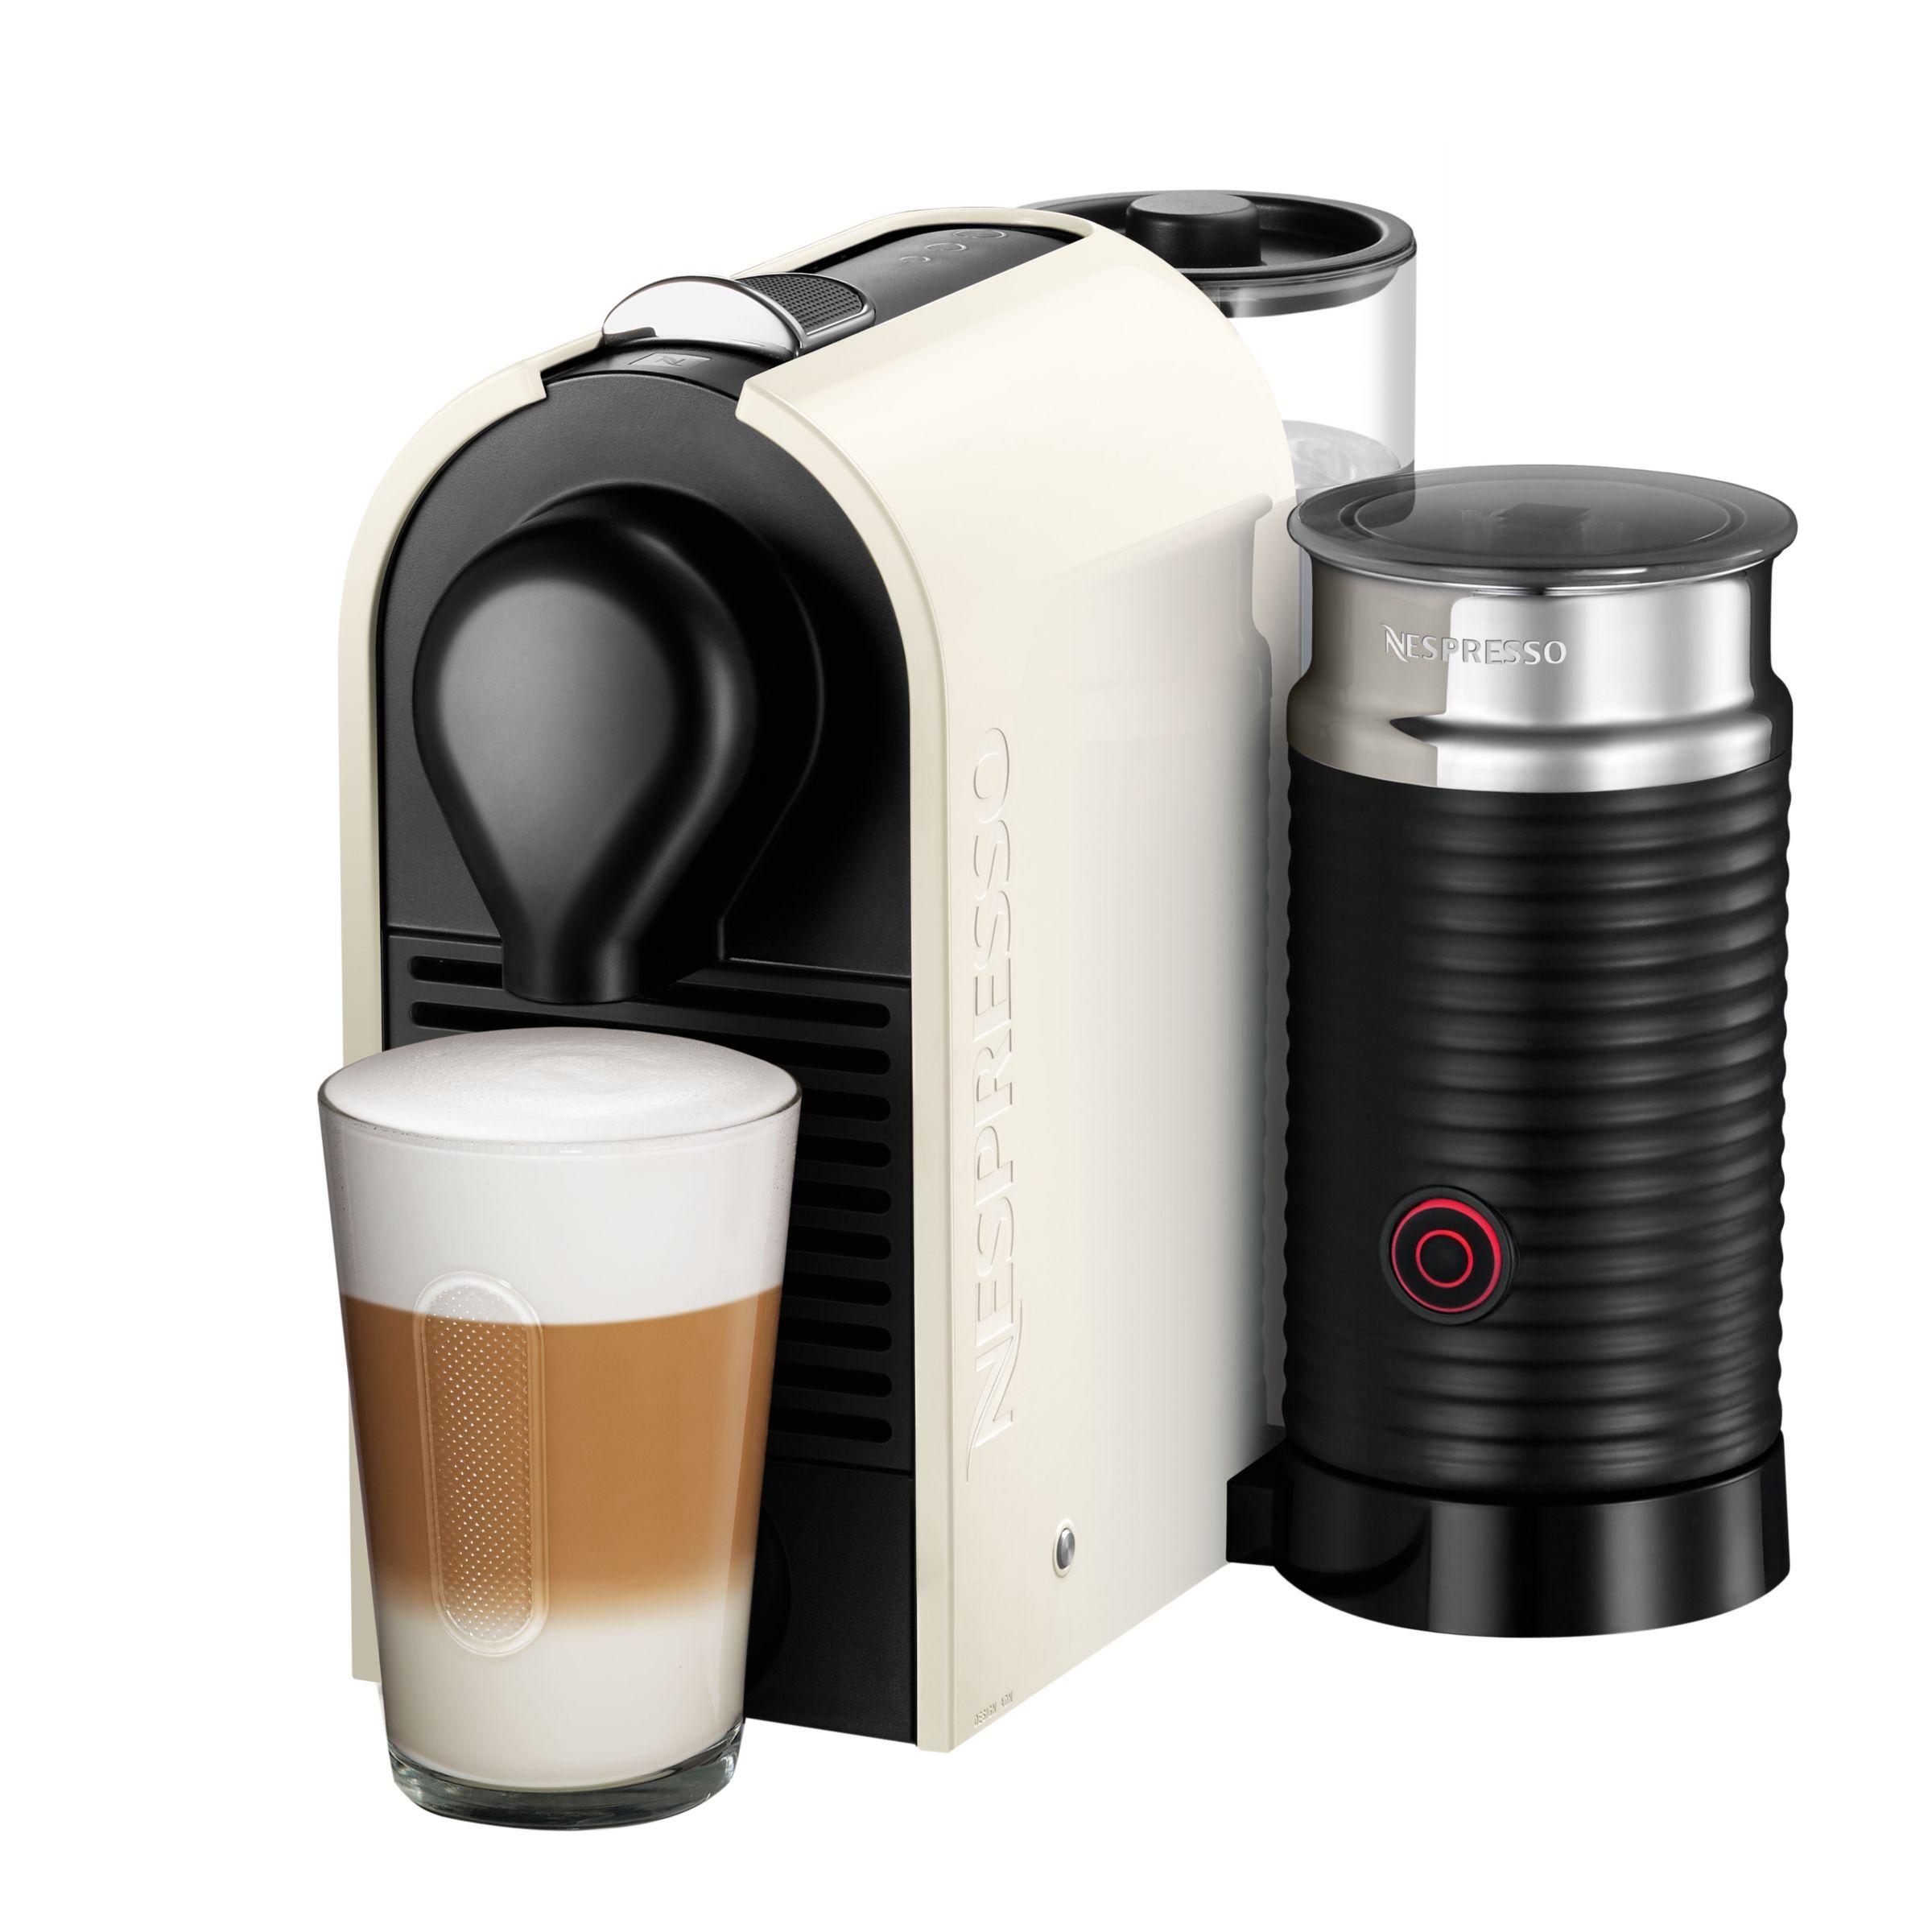 Krups Nespresso U Coffee Machine with Aeroccino by KRUPS, Cream